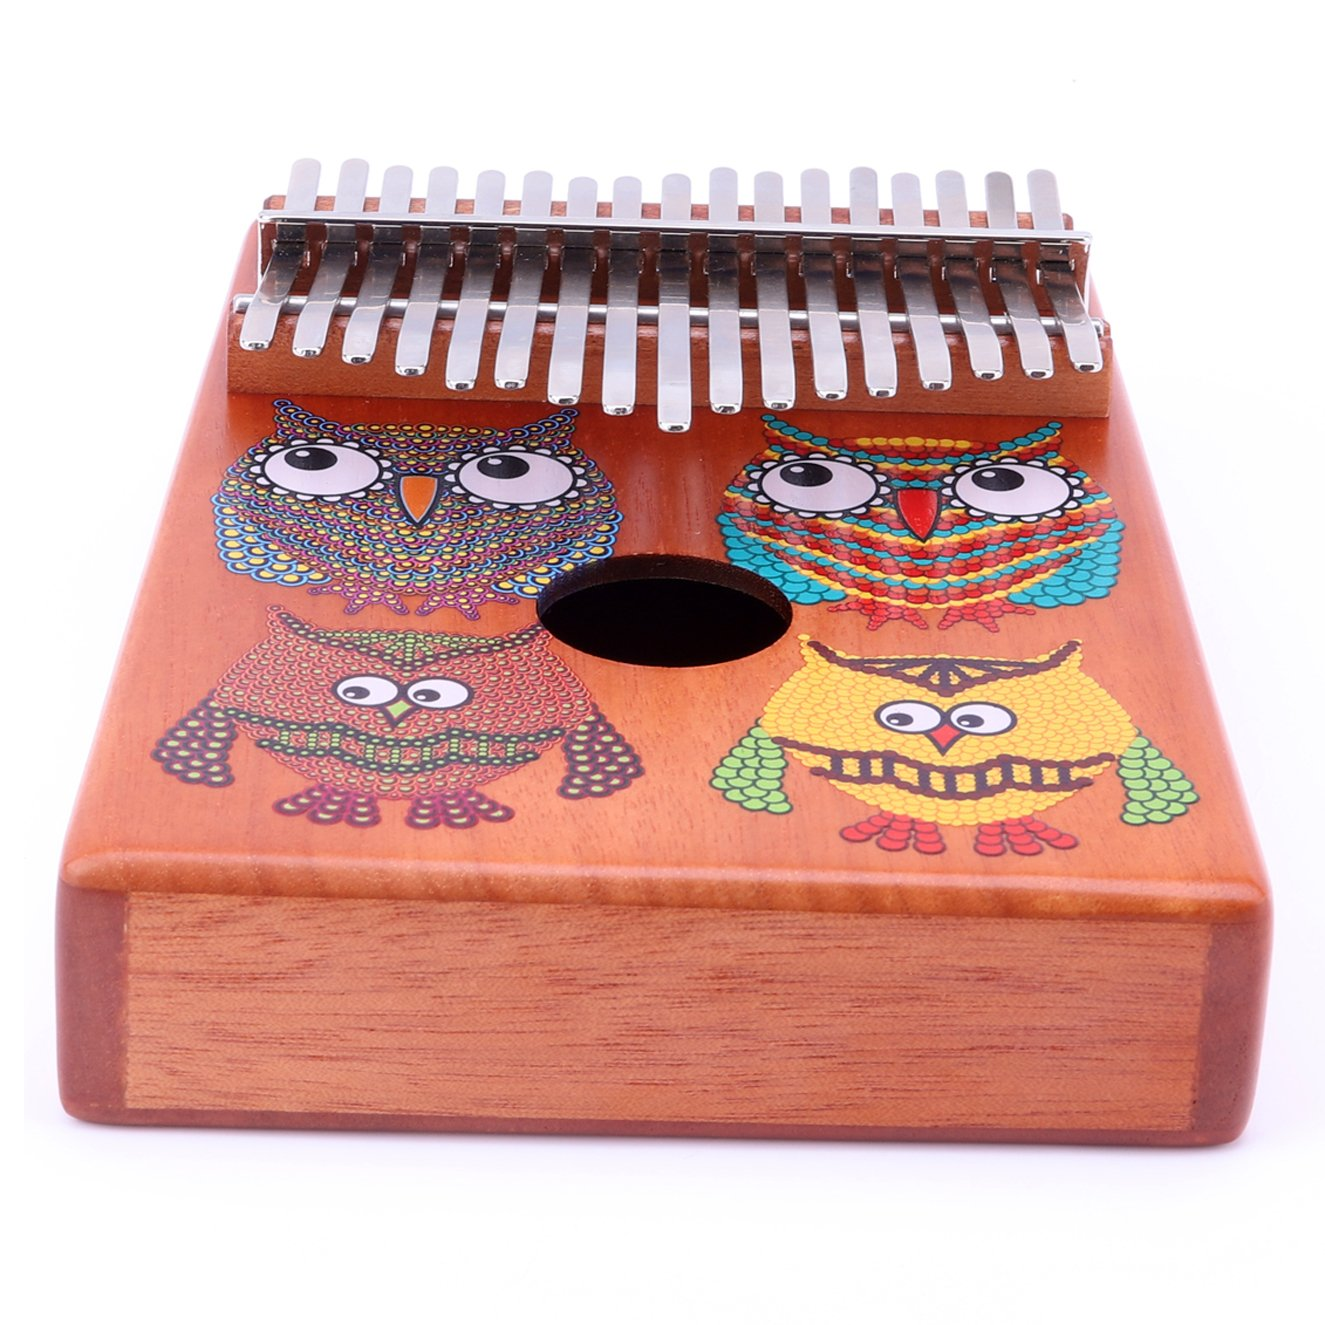 VI VICTORY 17 Key Mahogany Kalimba Colorful African Thumb Piano Finger Percussion Keyboard Music Instruments - Owl by VI VICTORY (Image #7)